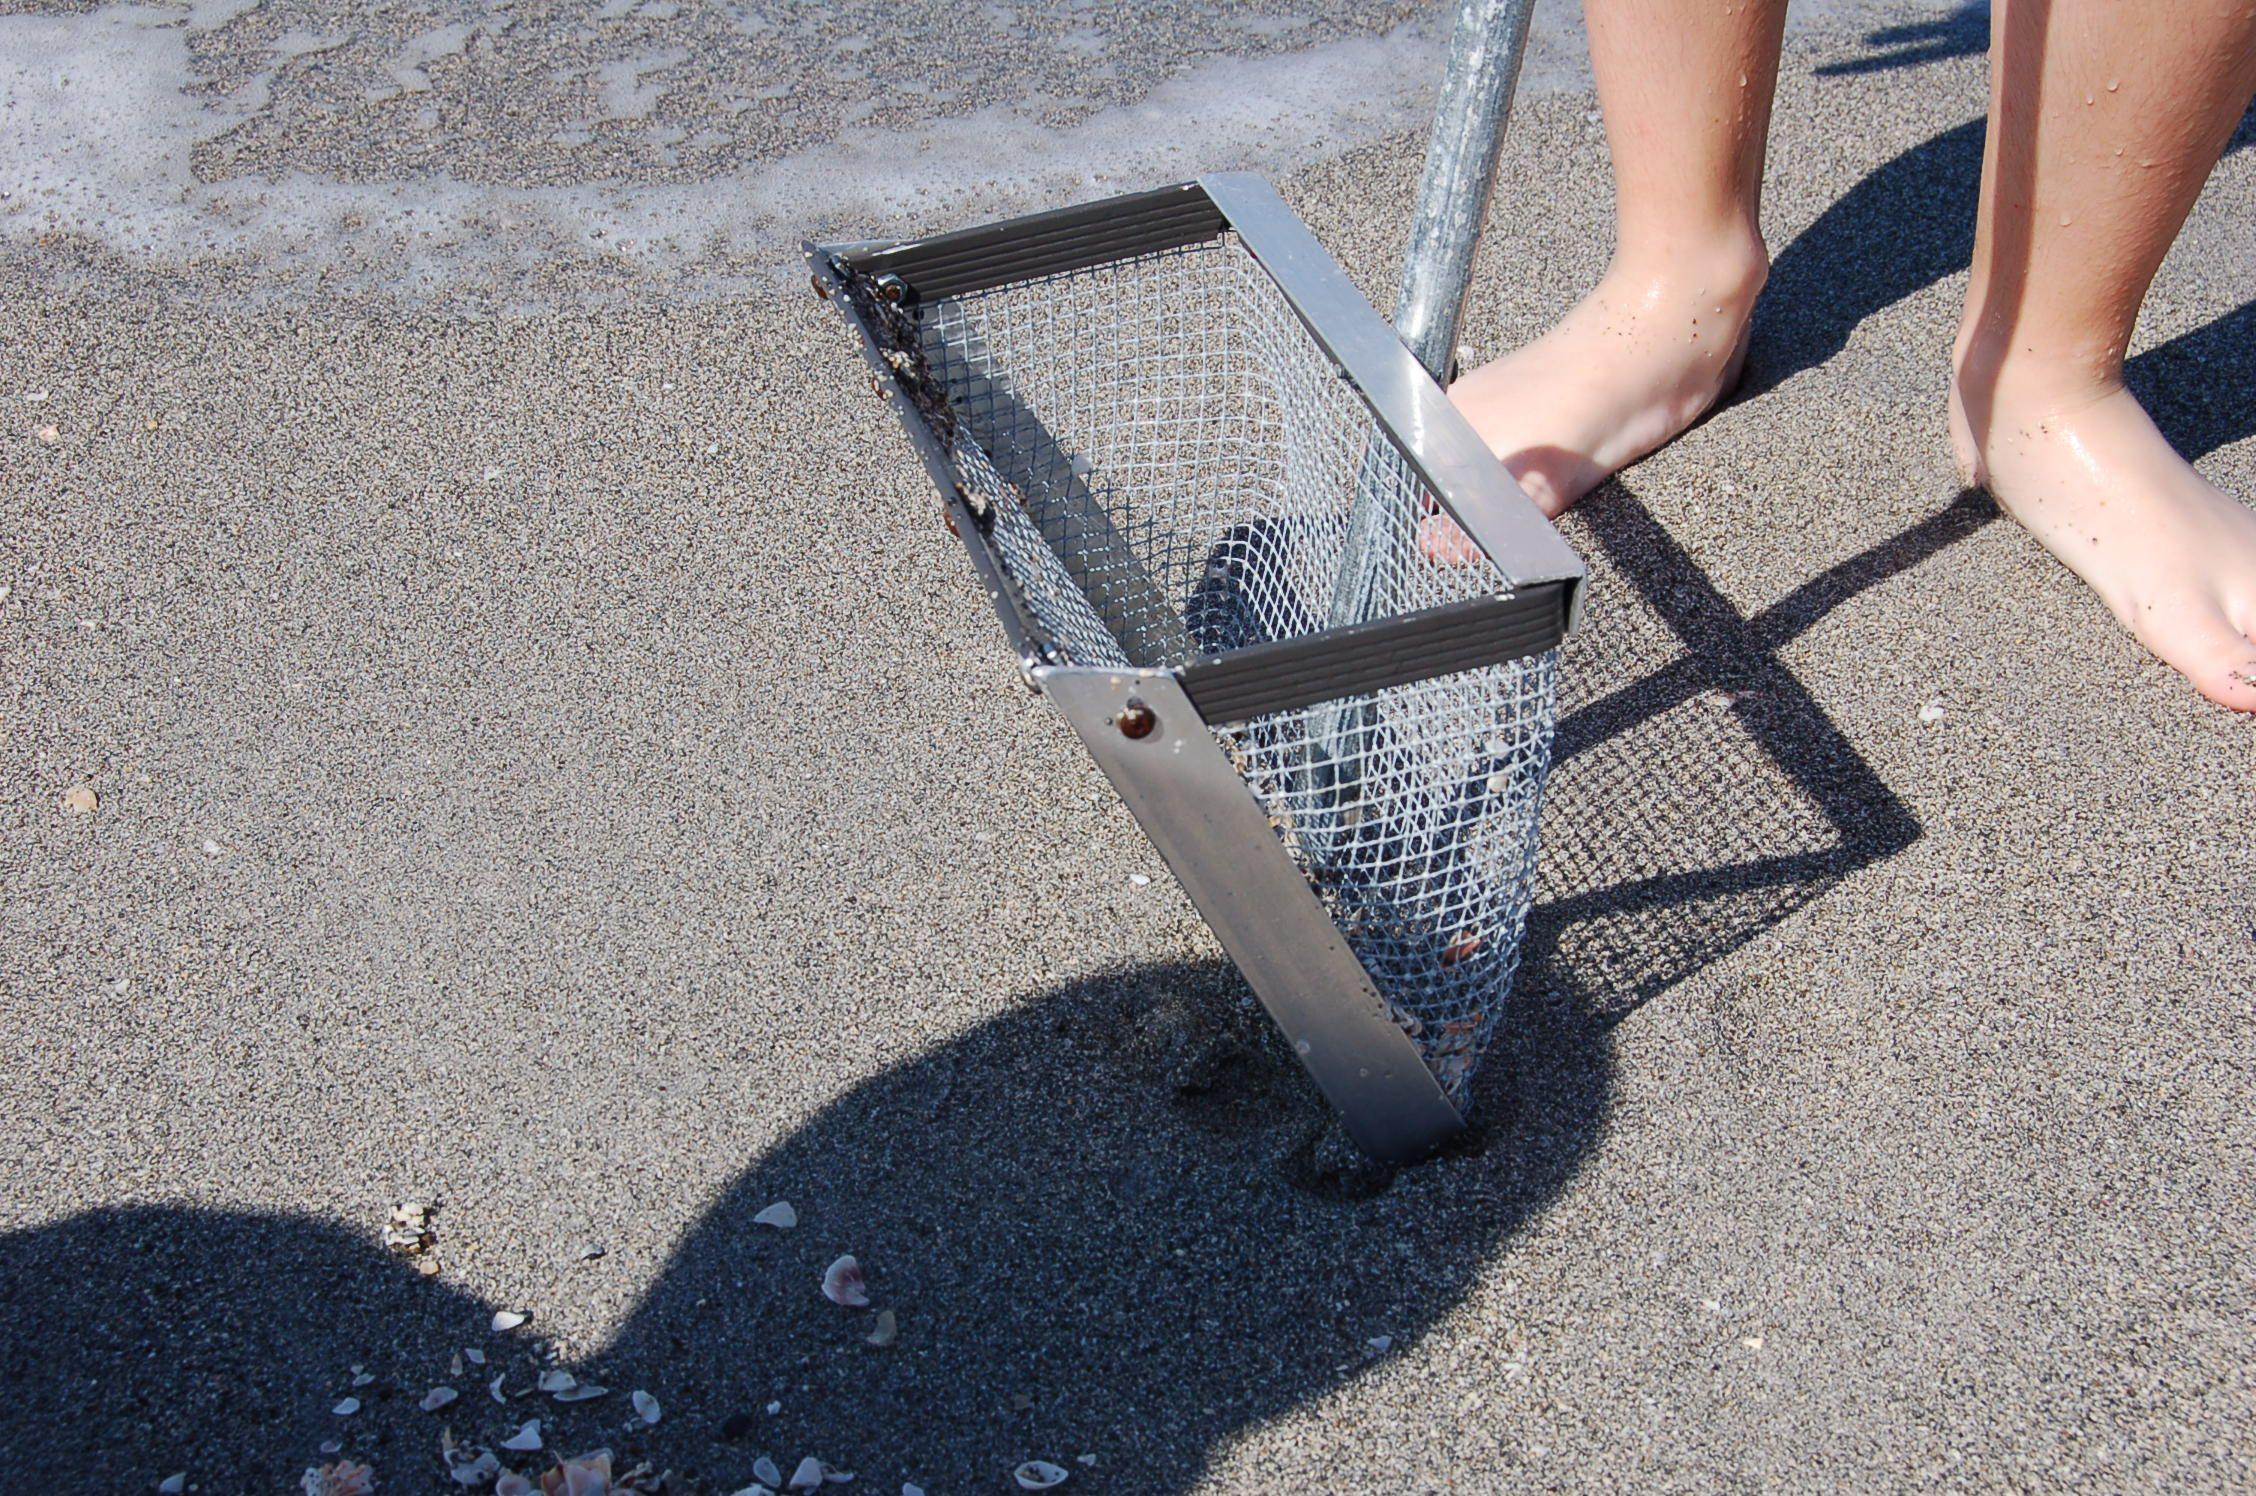 A Floridia Snow Shovel Used For Finding Shark Teeth On The Beach Or For Pulling Shells At The Break Line Venice Beach Florida Venice Florida Shark Teeth